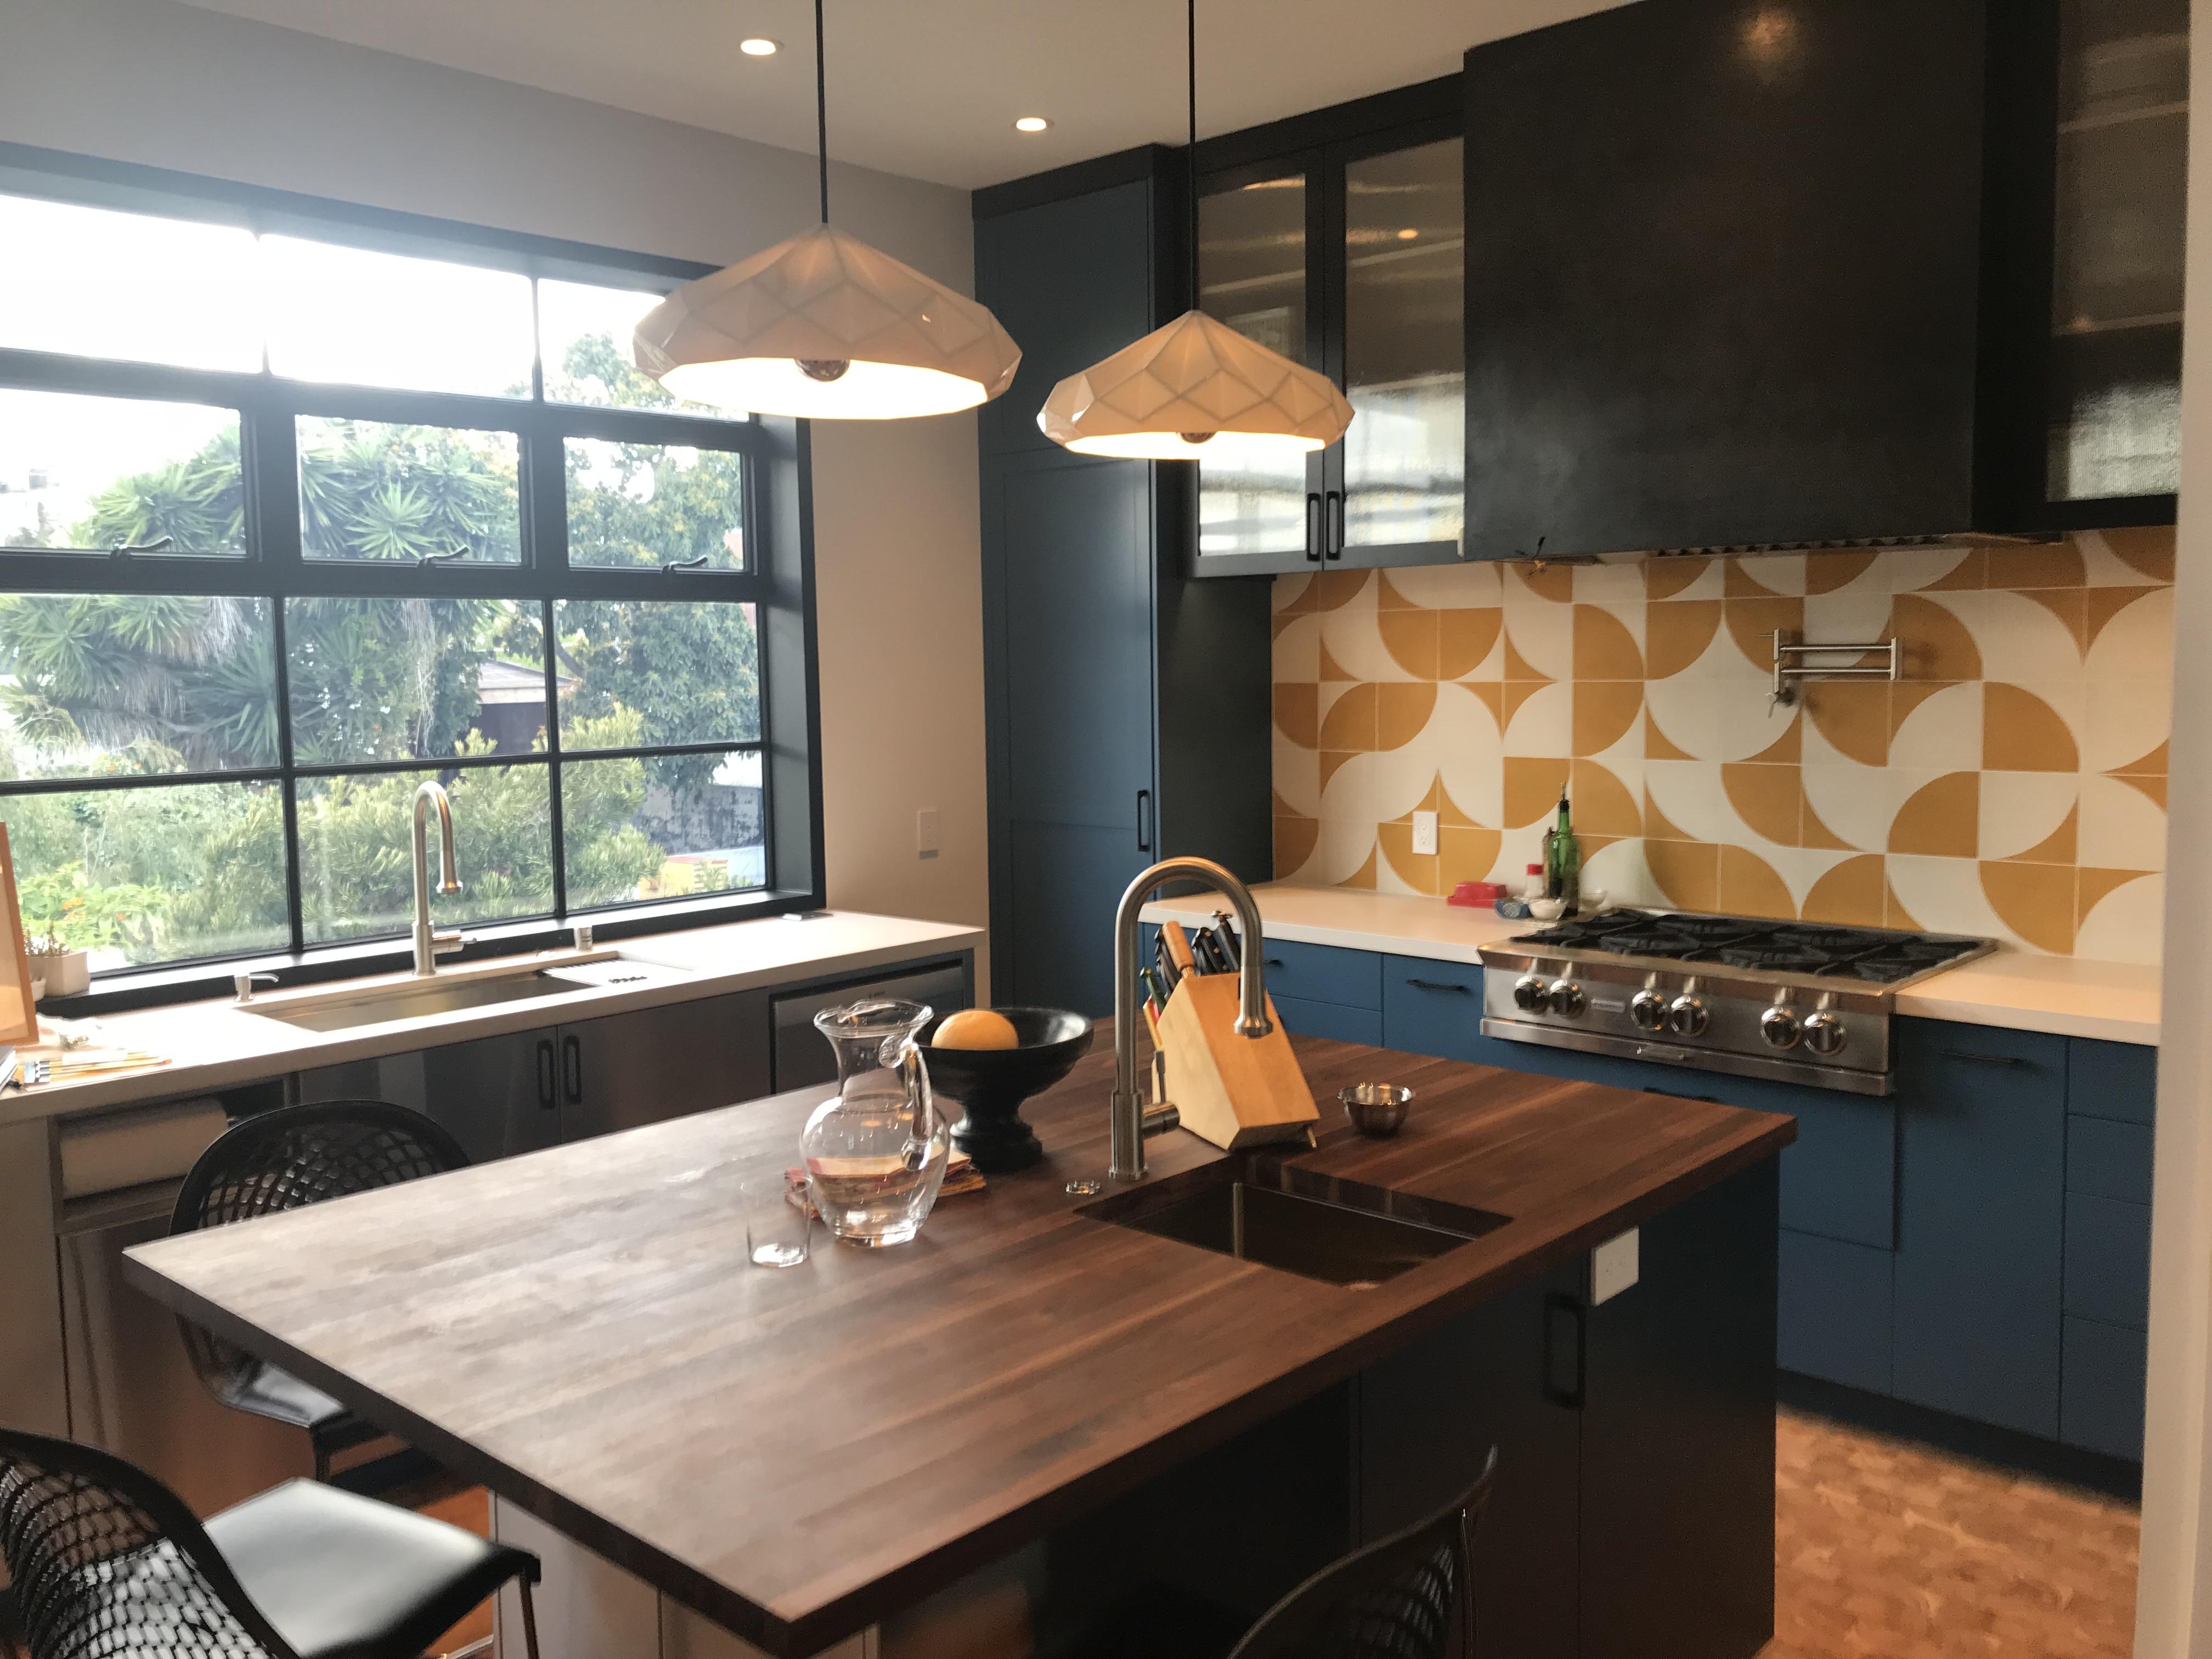 Echo Fortuna Doumani Kitchen backsplash Granada Cement Tile